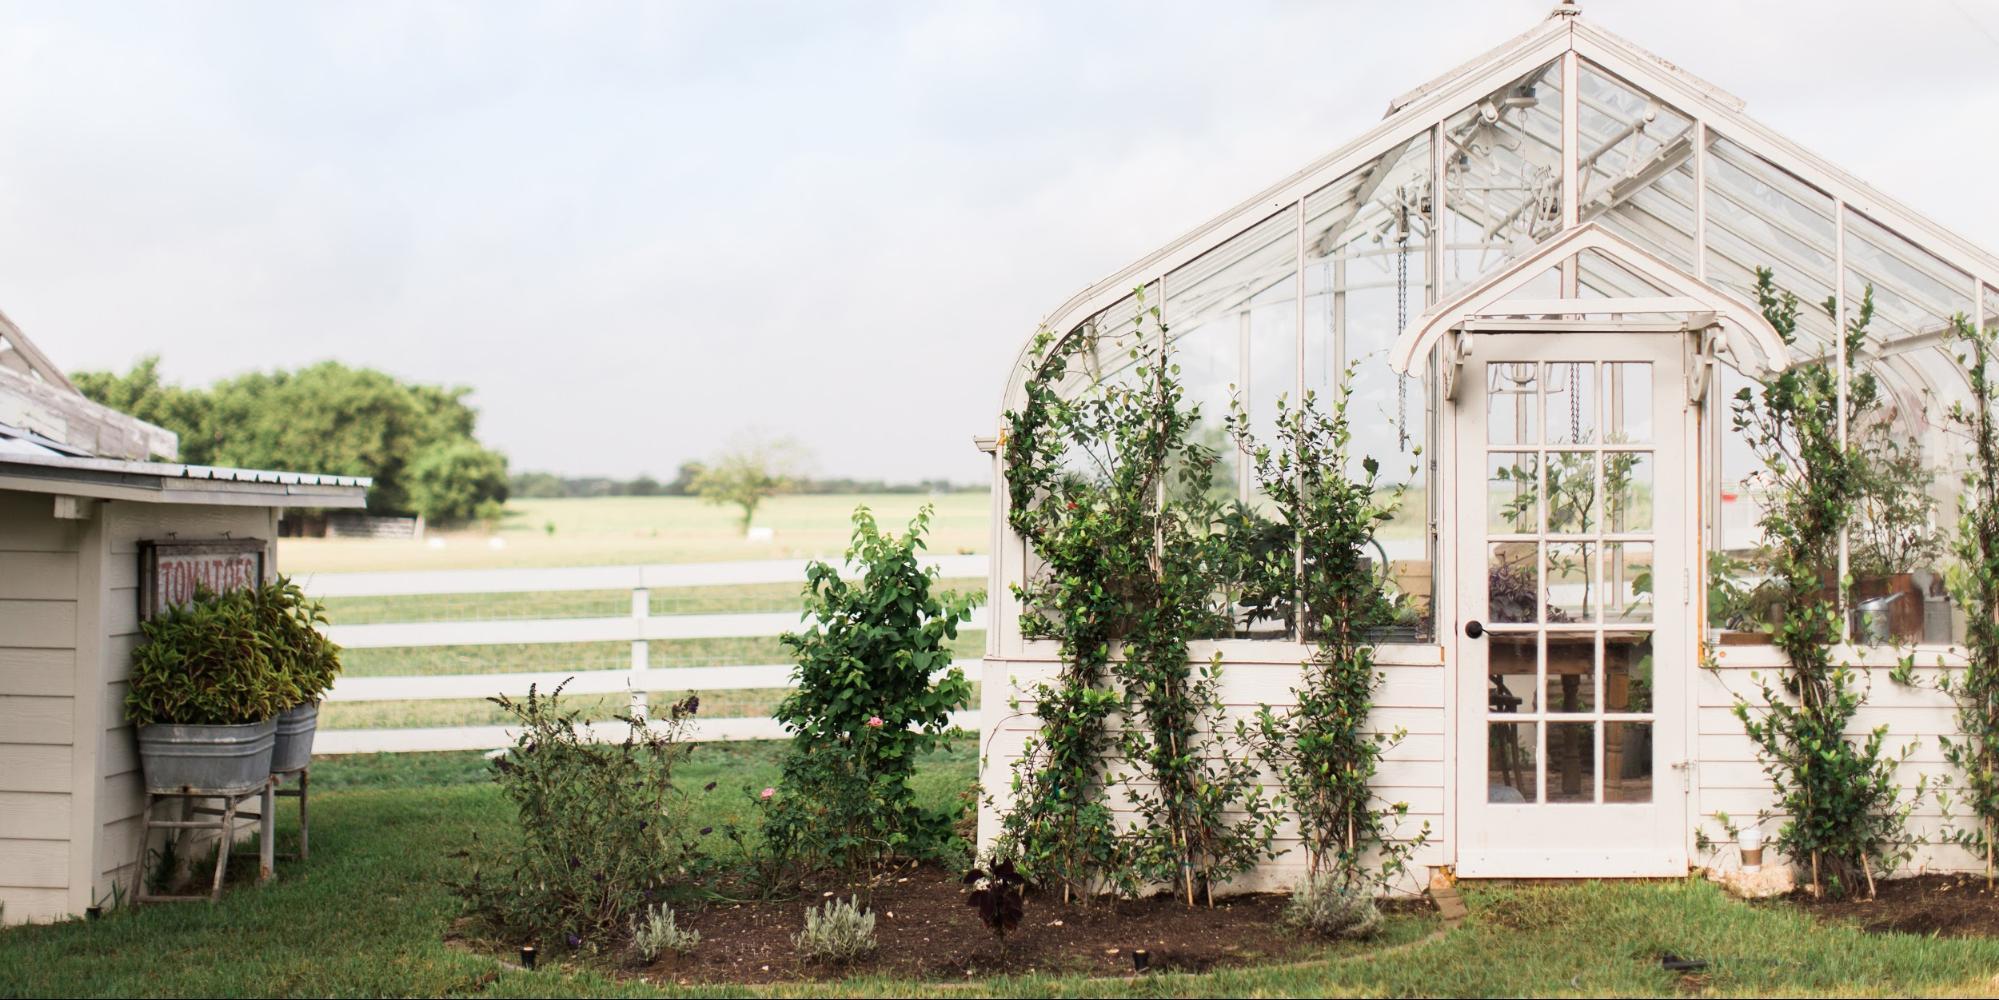 Greenhouse joanna gaines